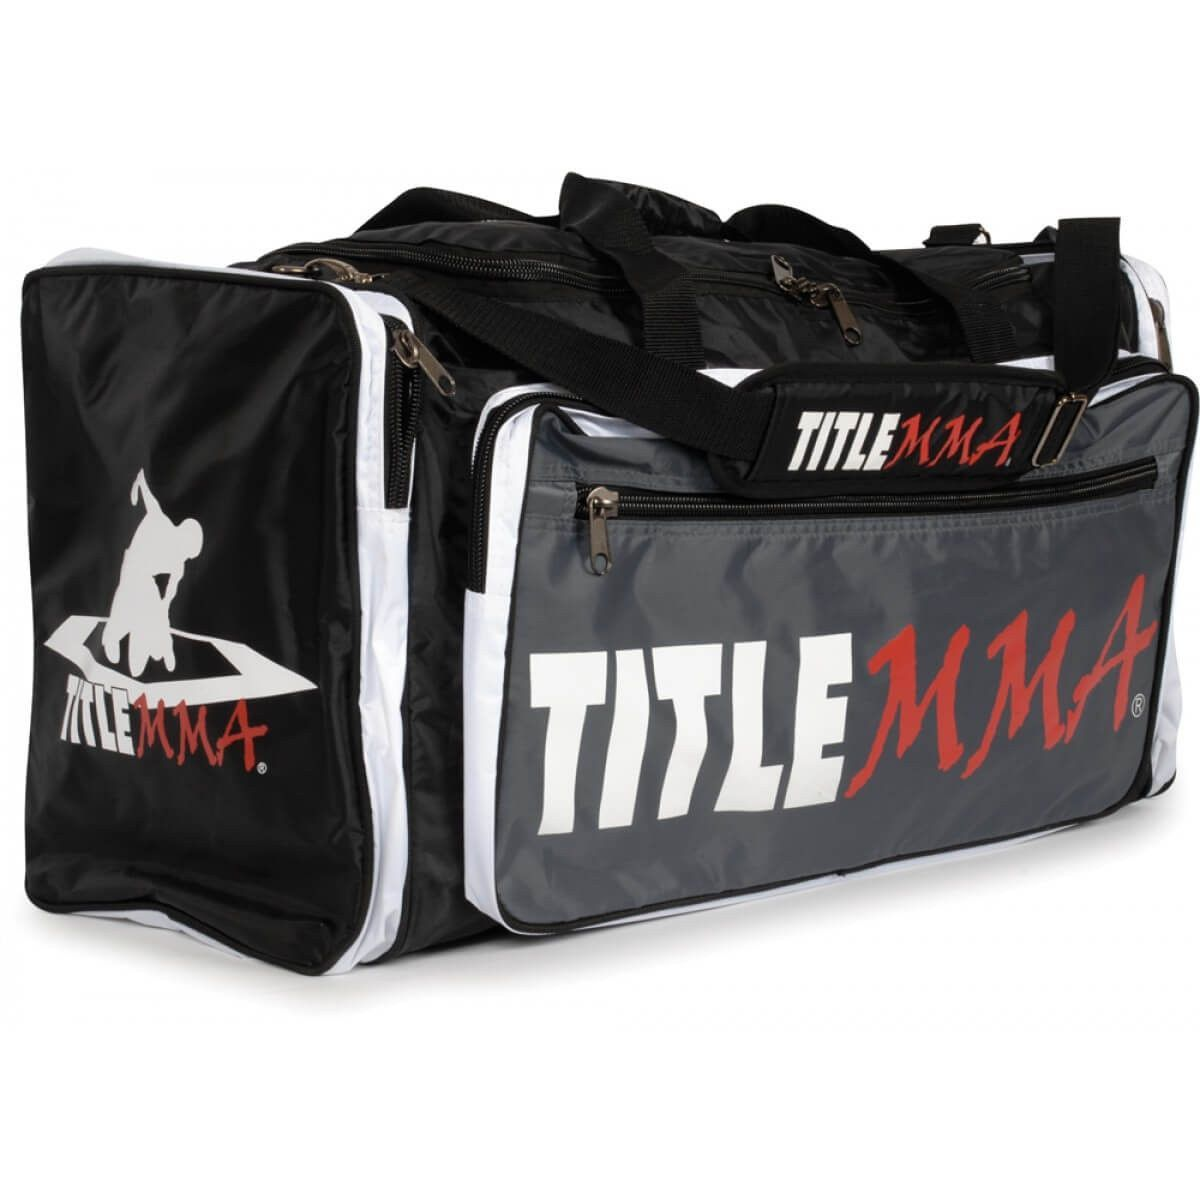 Le Mma Mega Sport Duffel Bag Kickboxing Is Love